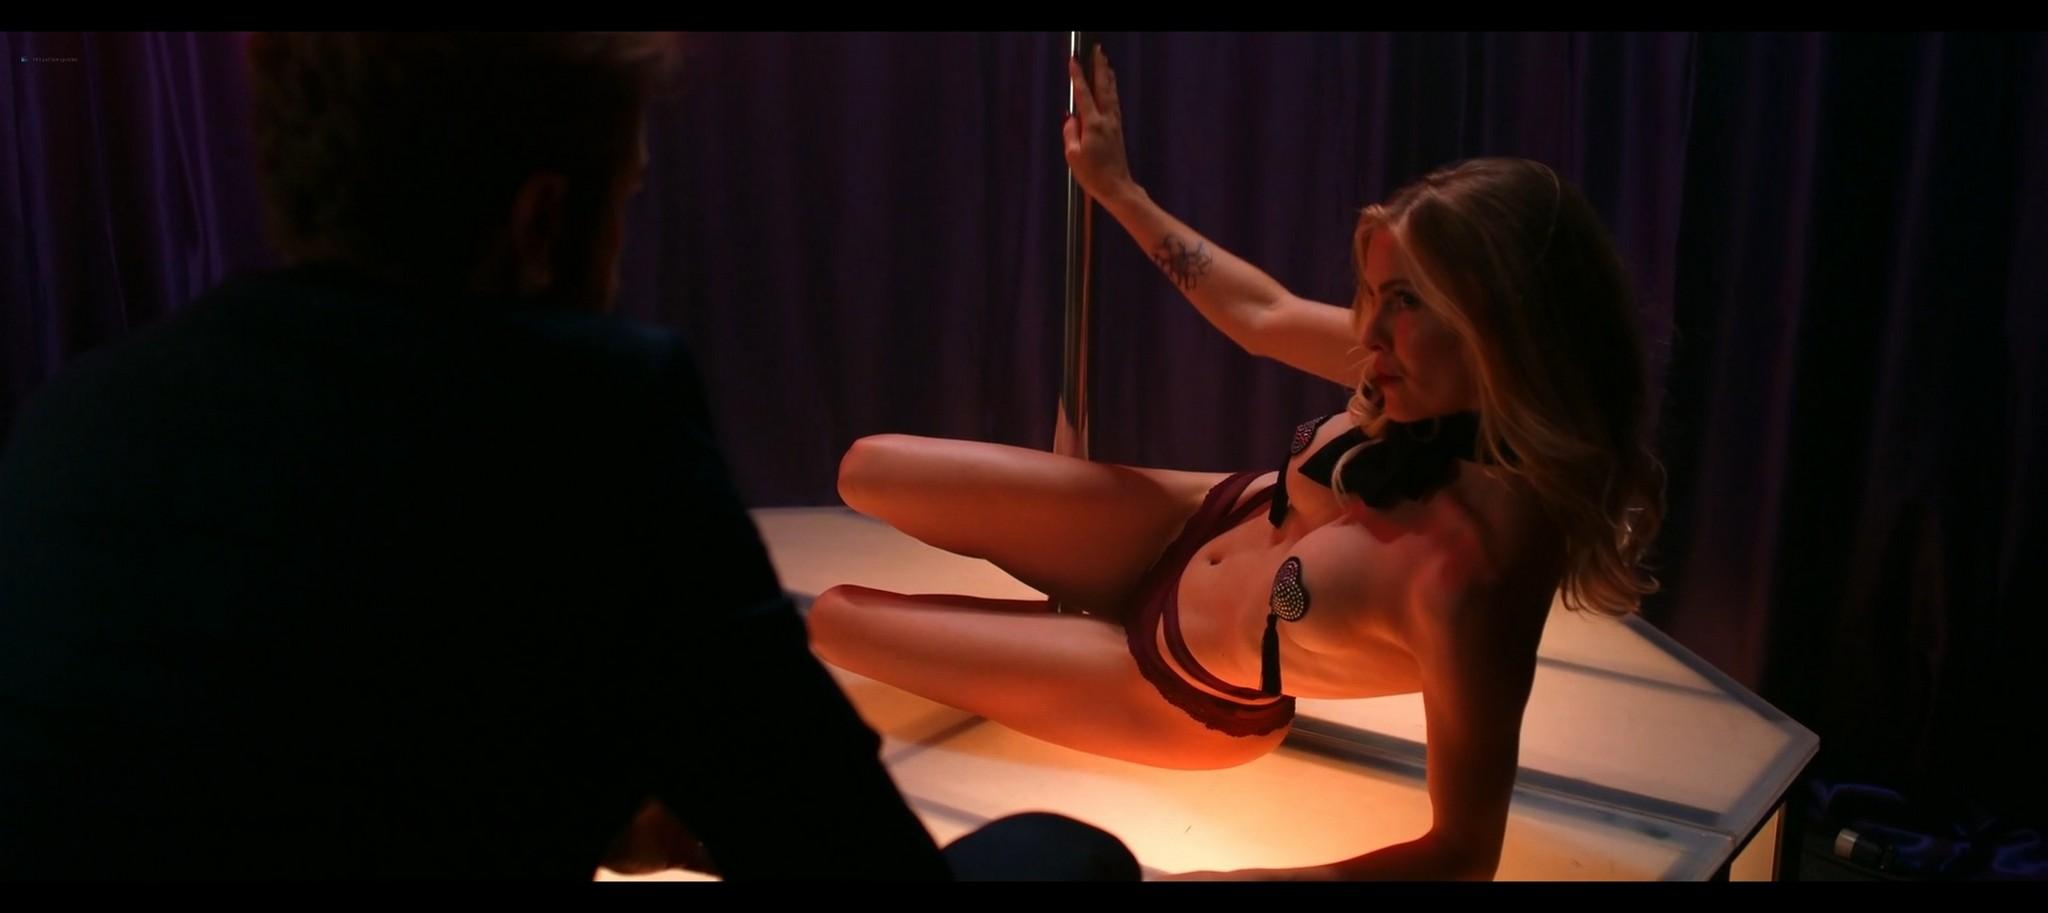 Kenzie Dalton hot Drue Knapp Ava Locklear sexy A Dark Foe 2021 1080p Web 13